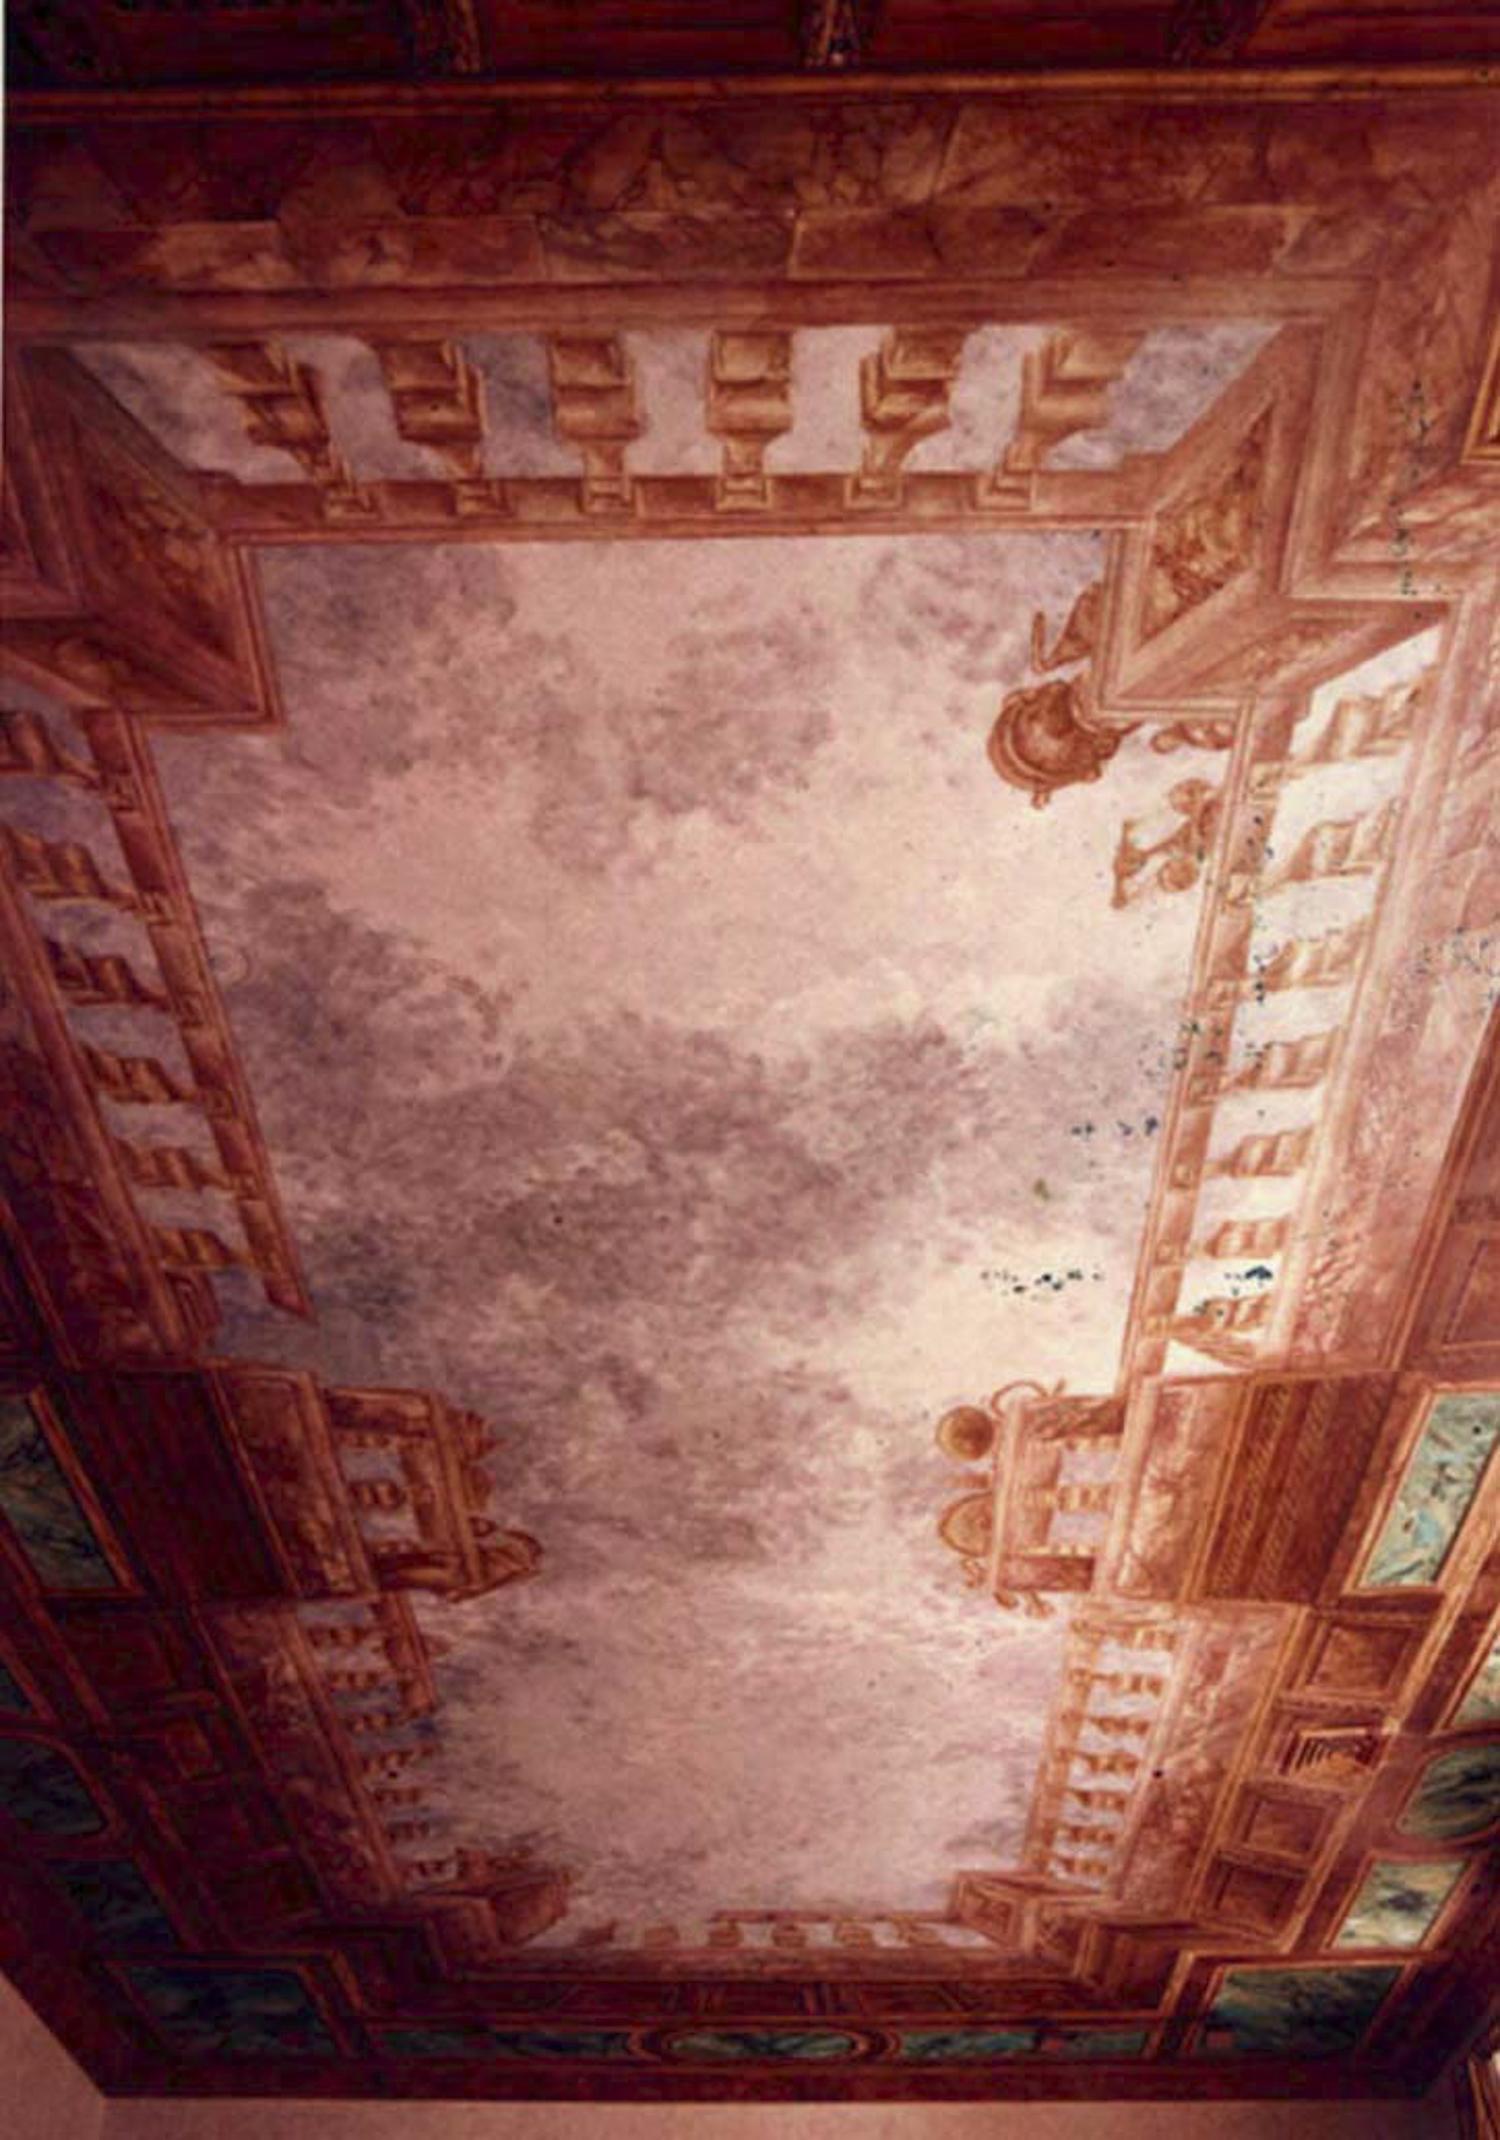 Trompe-l'œil ceiling painting, Palm Beach